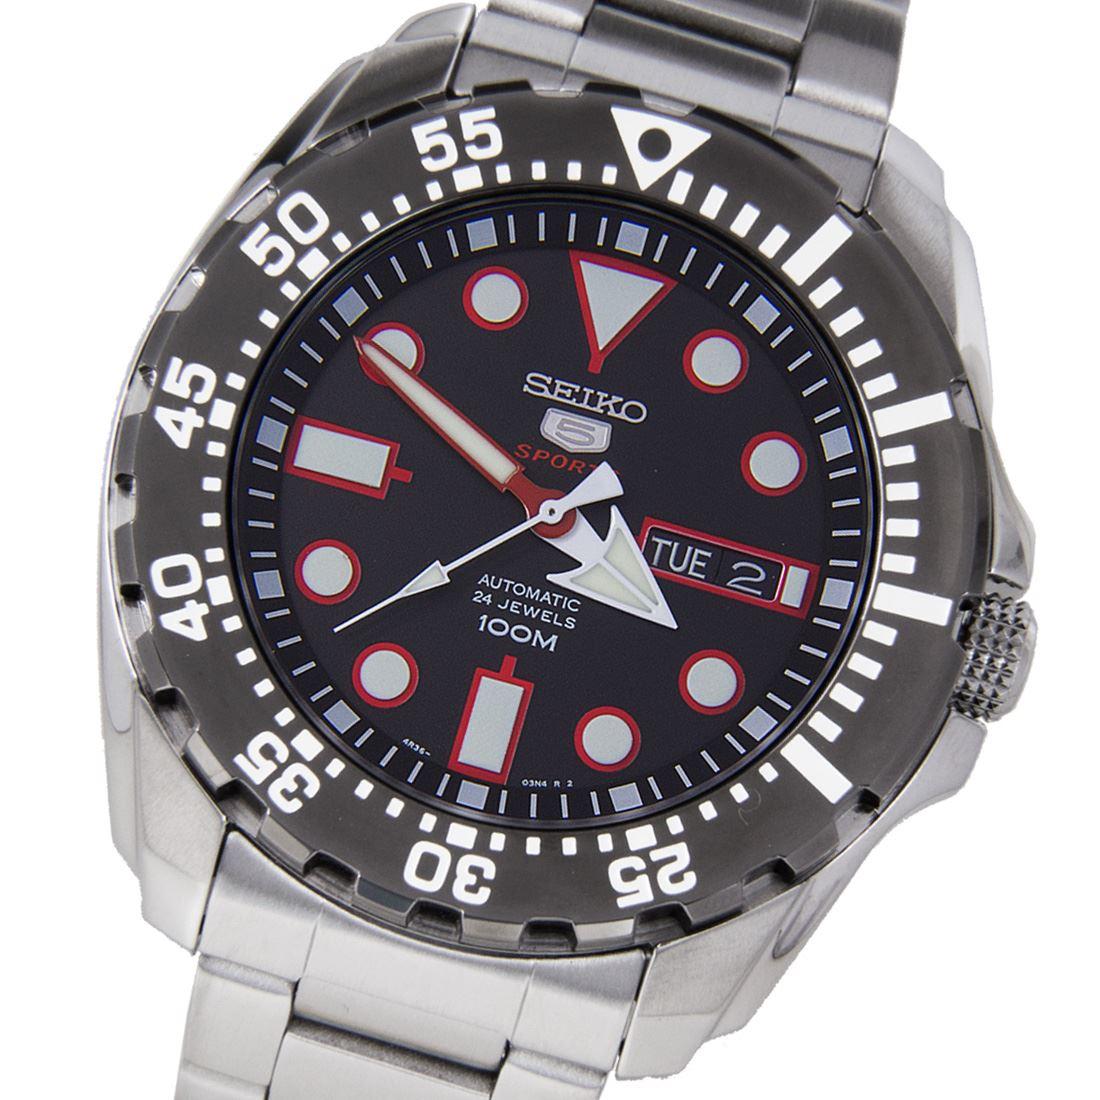 Seiko 5 sports diver watch srp601k1 srp603k1 srp605k1 ebay - Seiko dive watch history ...